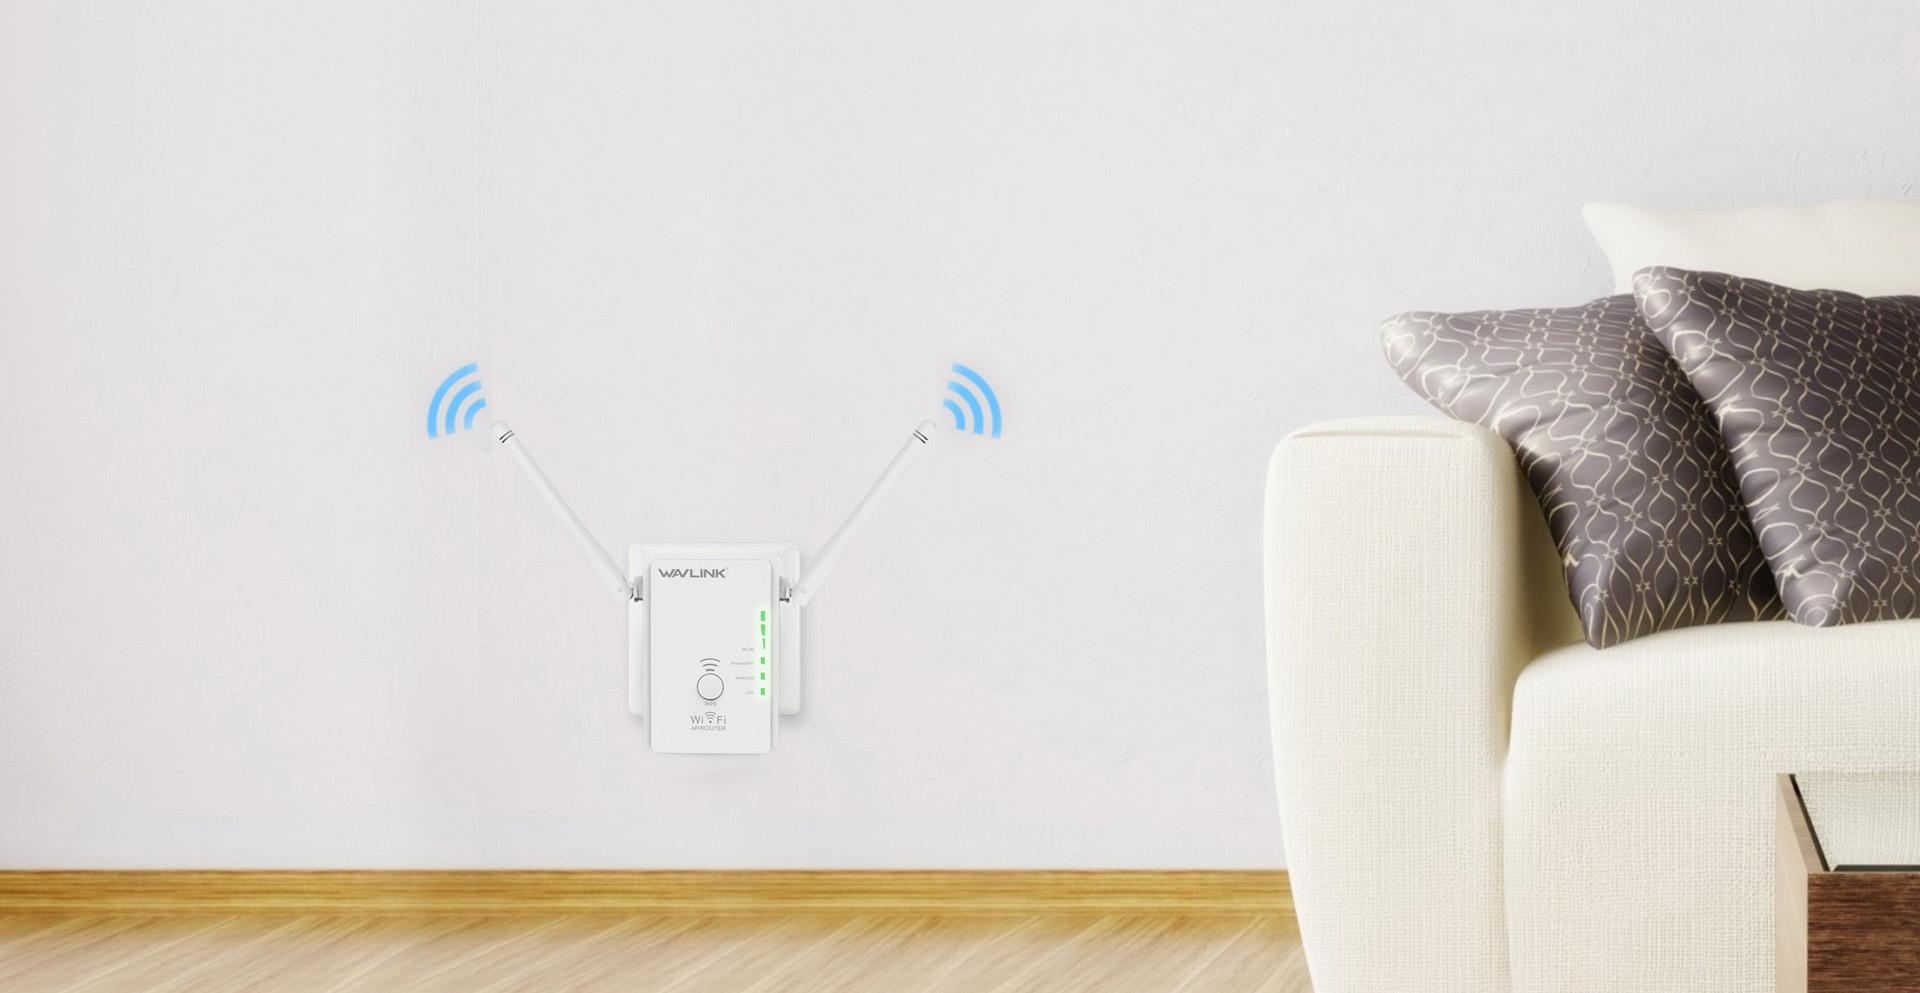 578R2中继器带智能LED灯,轻松找到最佳的放置位置